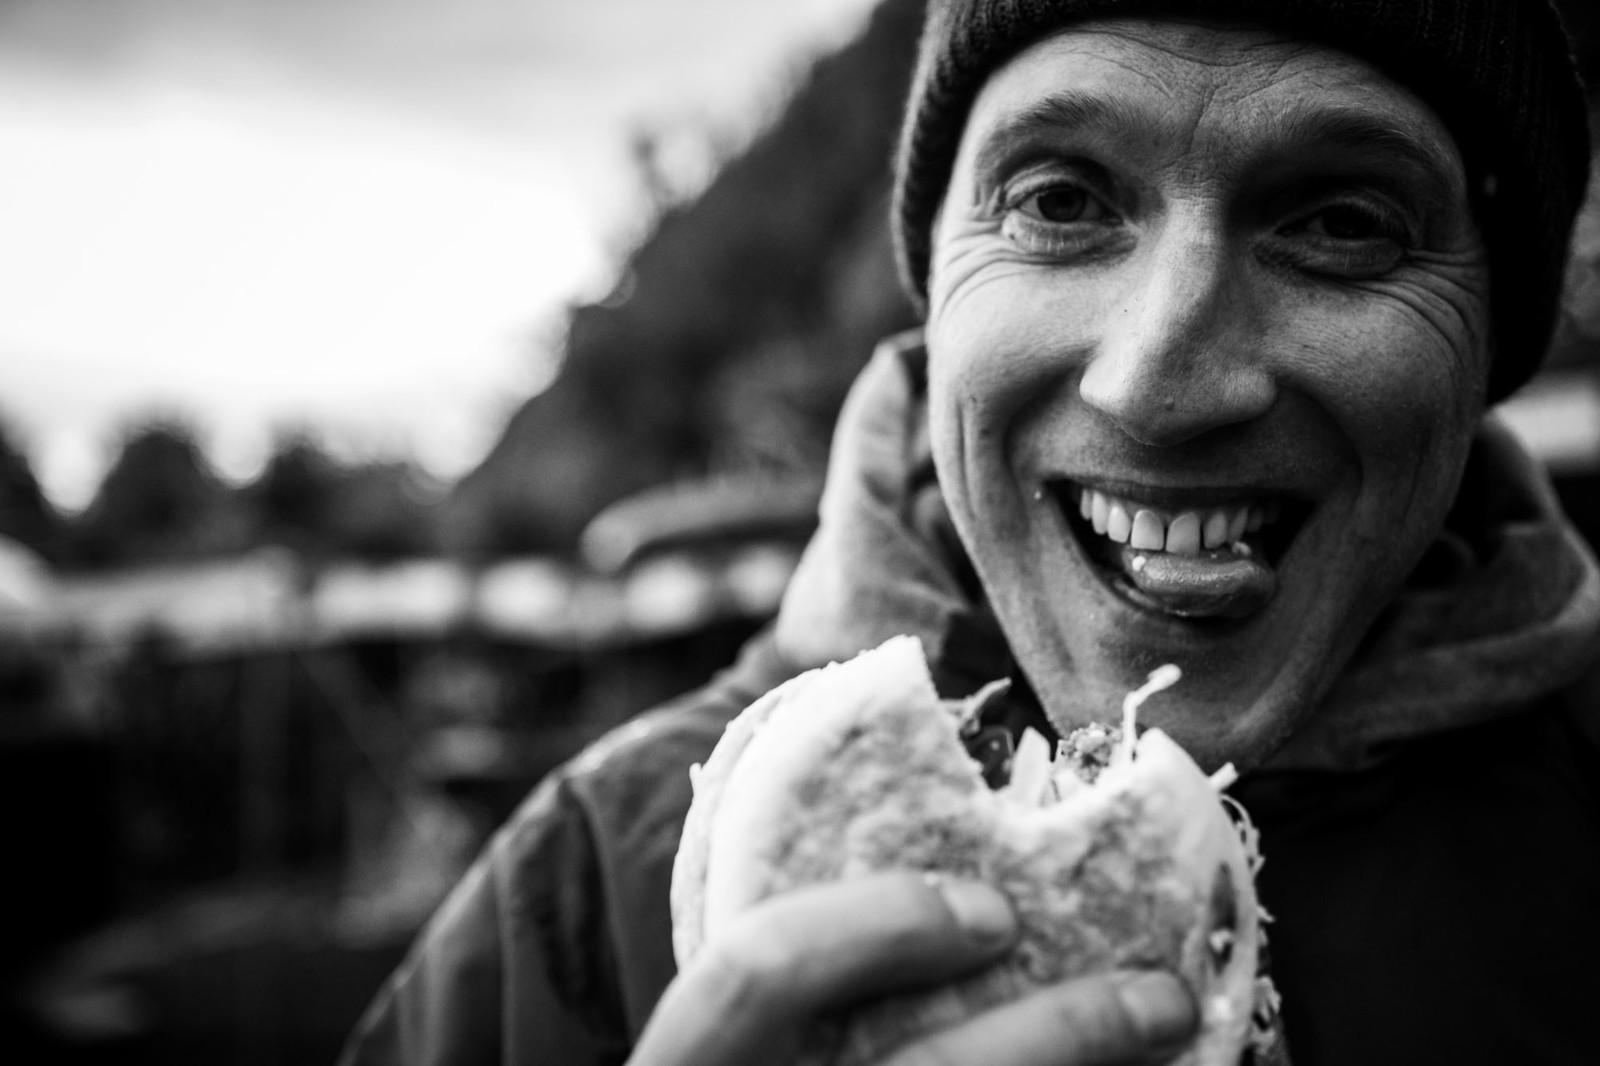 NZEnduro19 BB AS6I0669 - 2019 NZ Enduro Day 1 Photo Gallery - Mountain Biking Pictures - Vital MTB